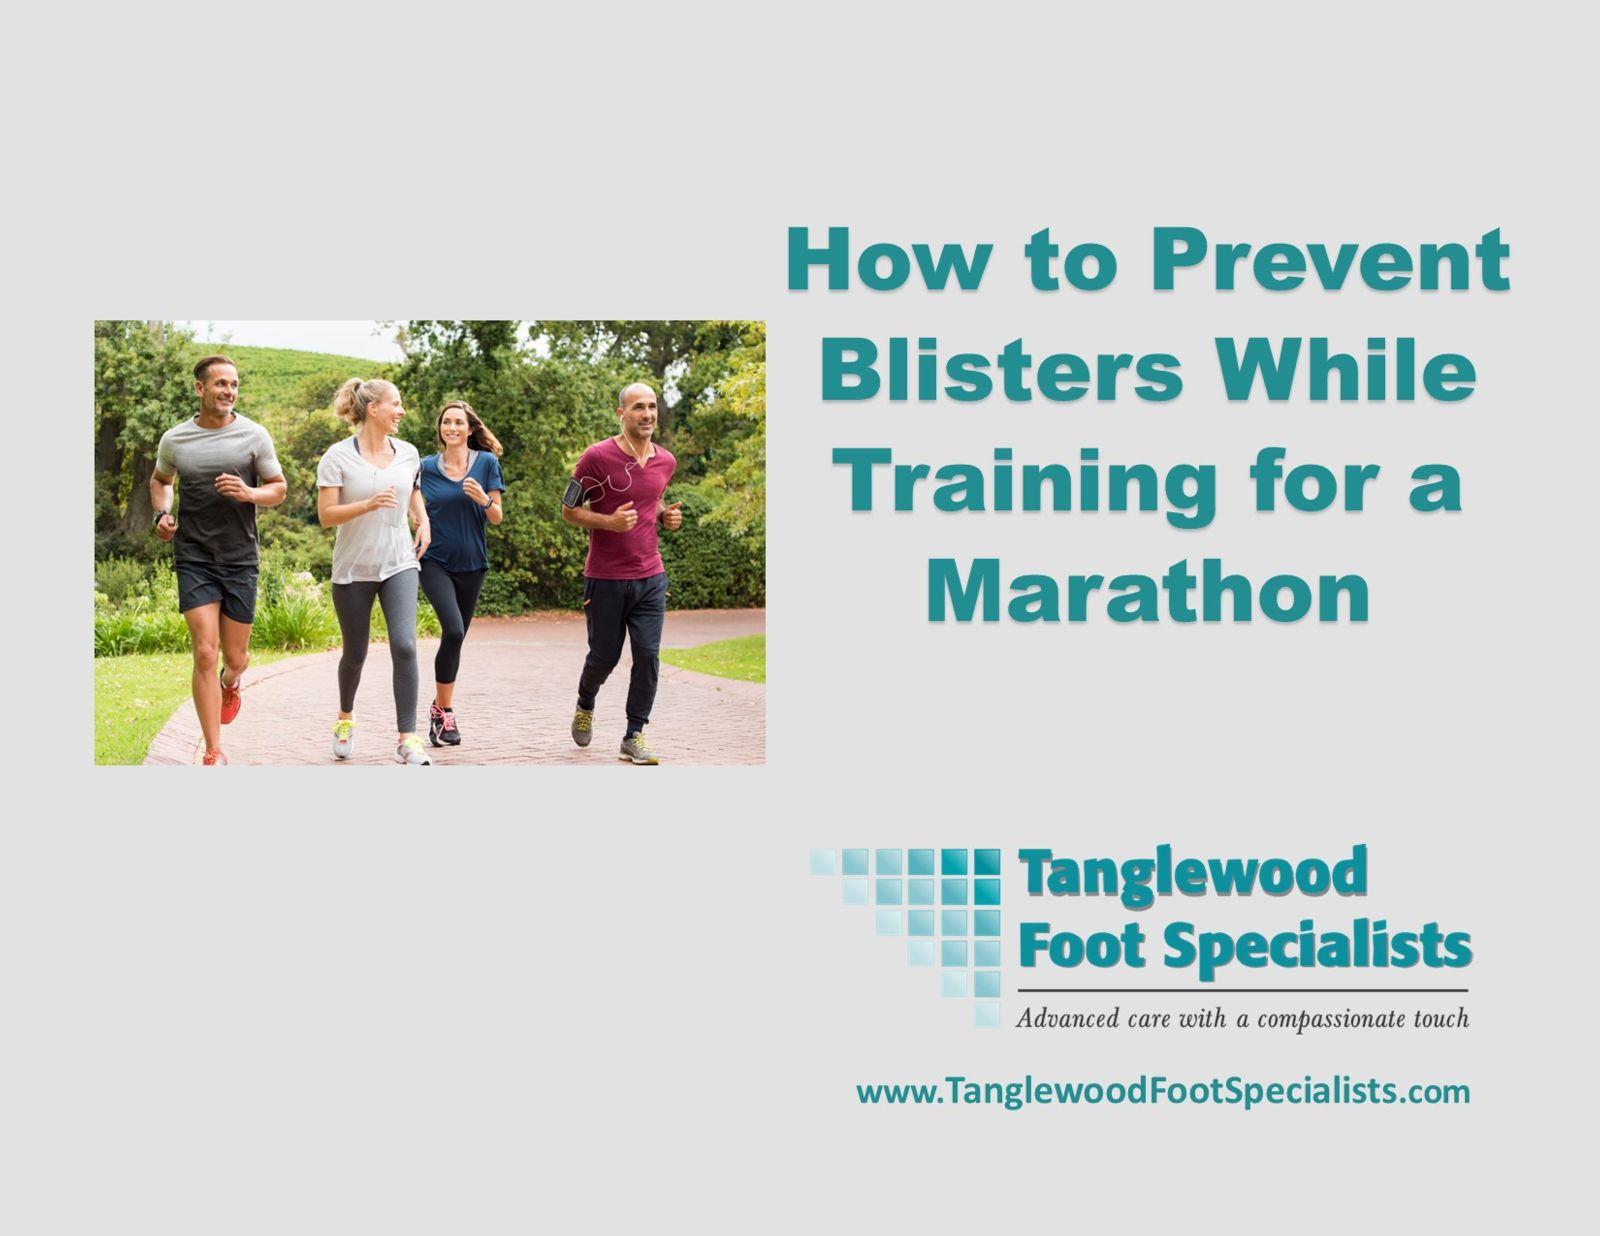 Houston podiatrist discusses preventing blisters during marathon training